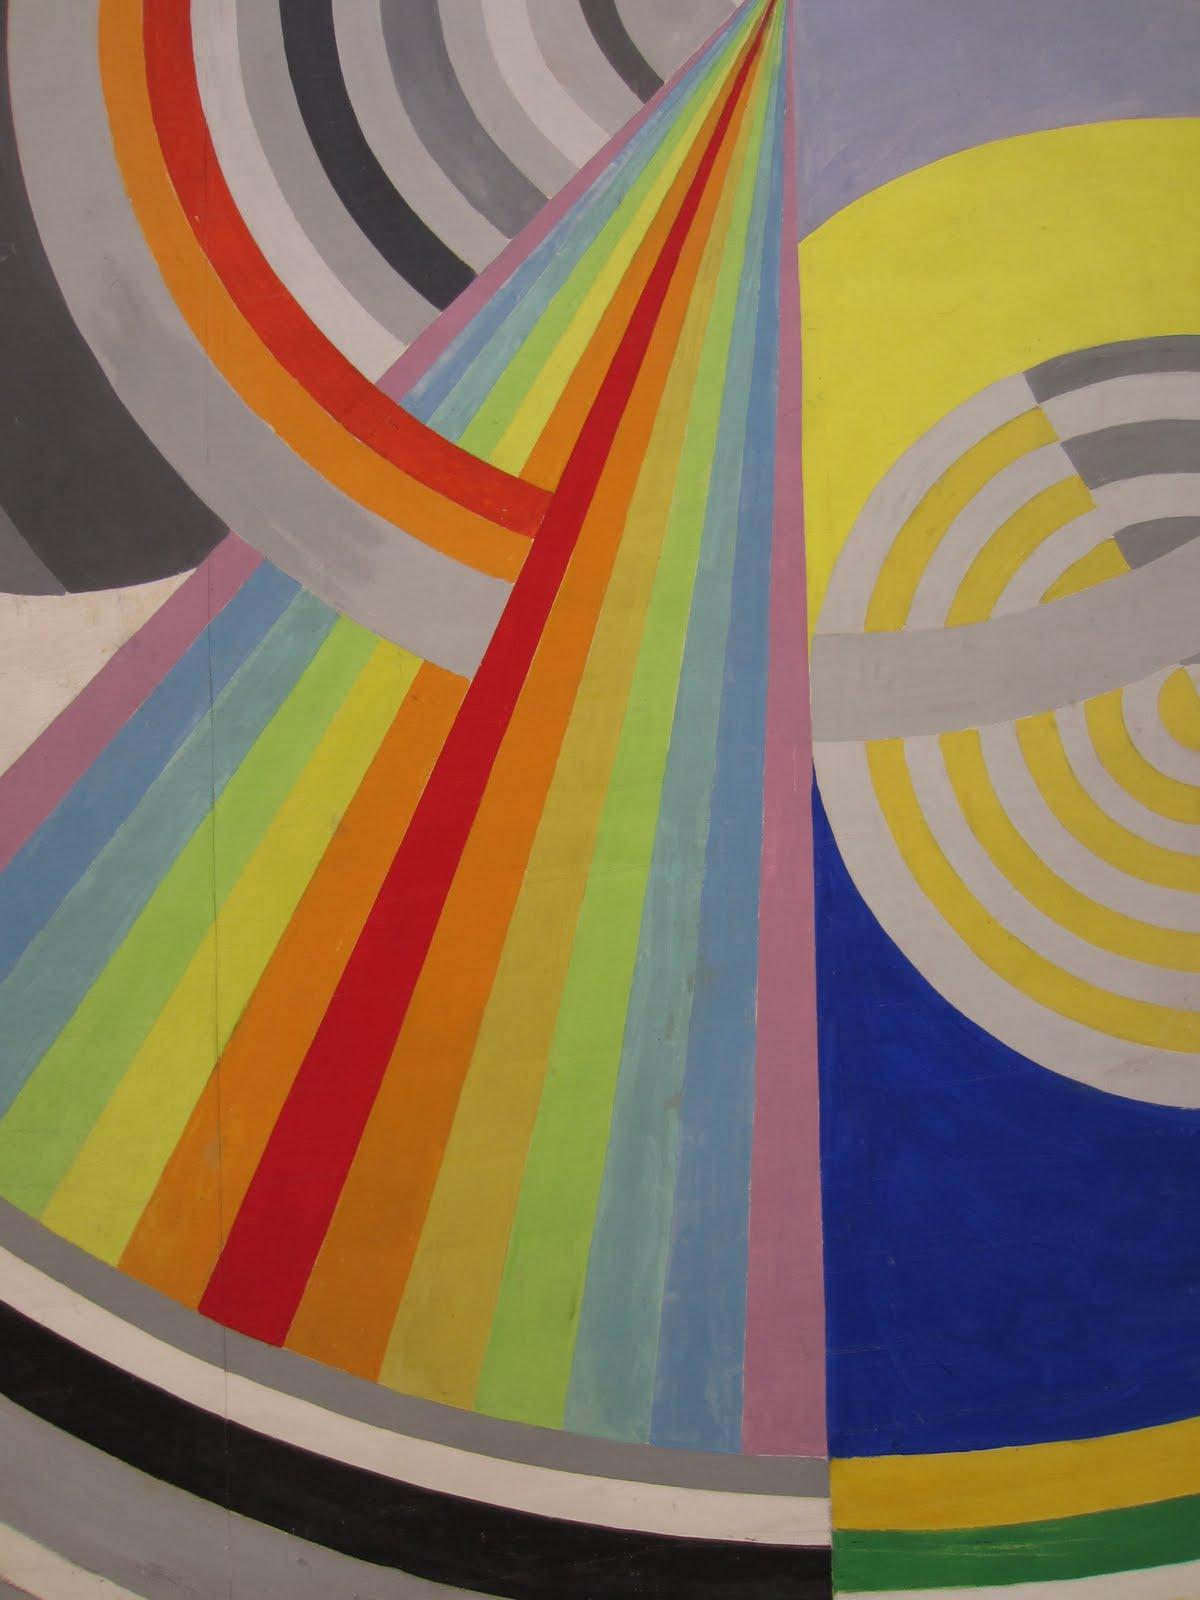 Miad Paris 2011 Robert Delaunay At The Musee D Art Moderne